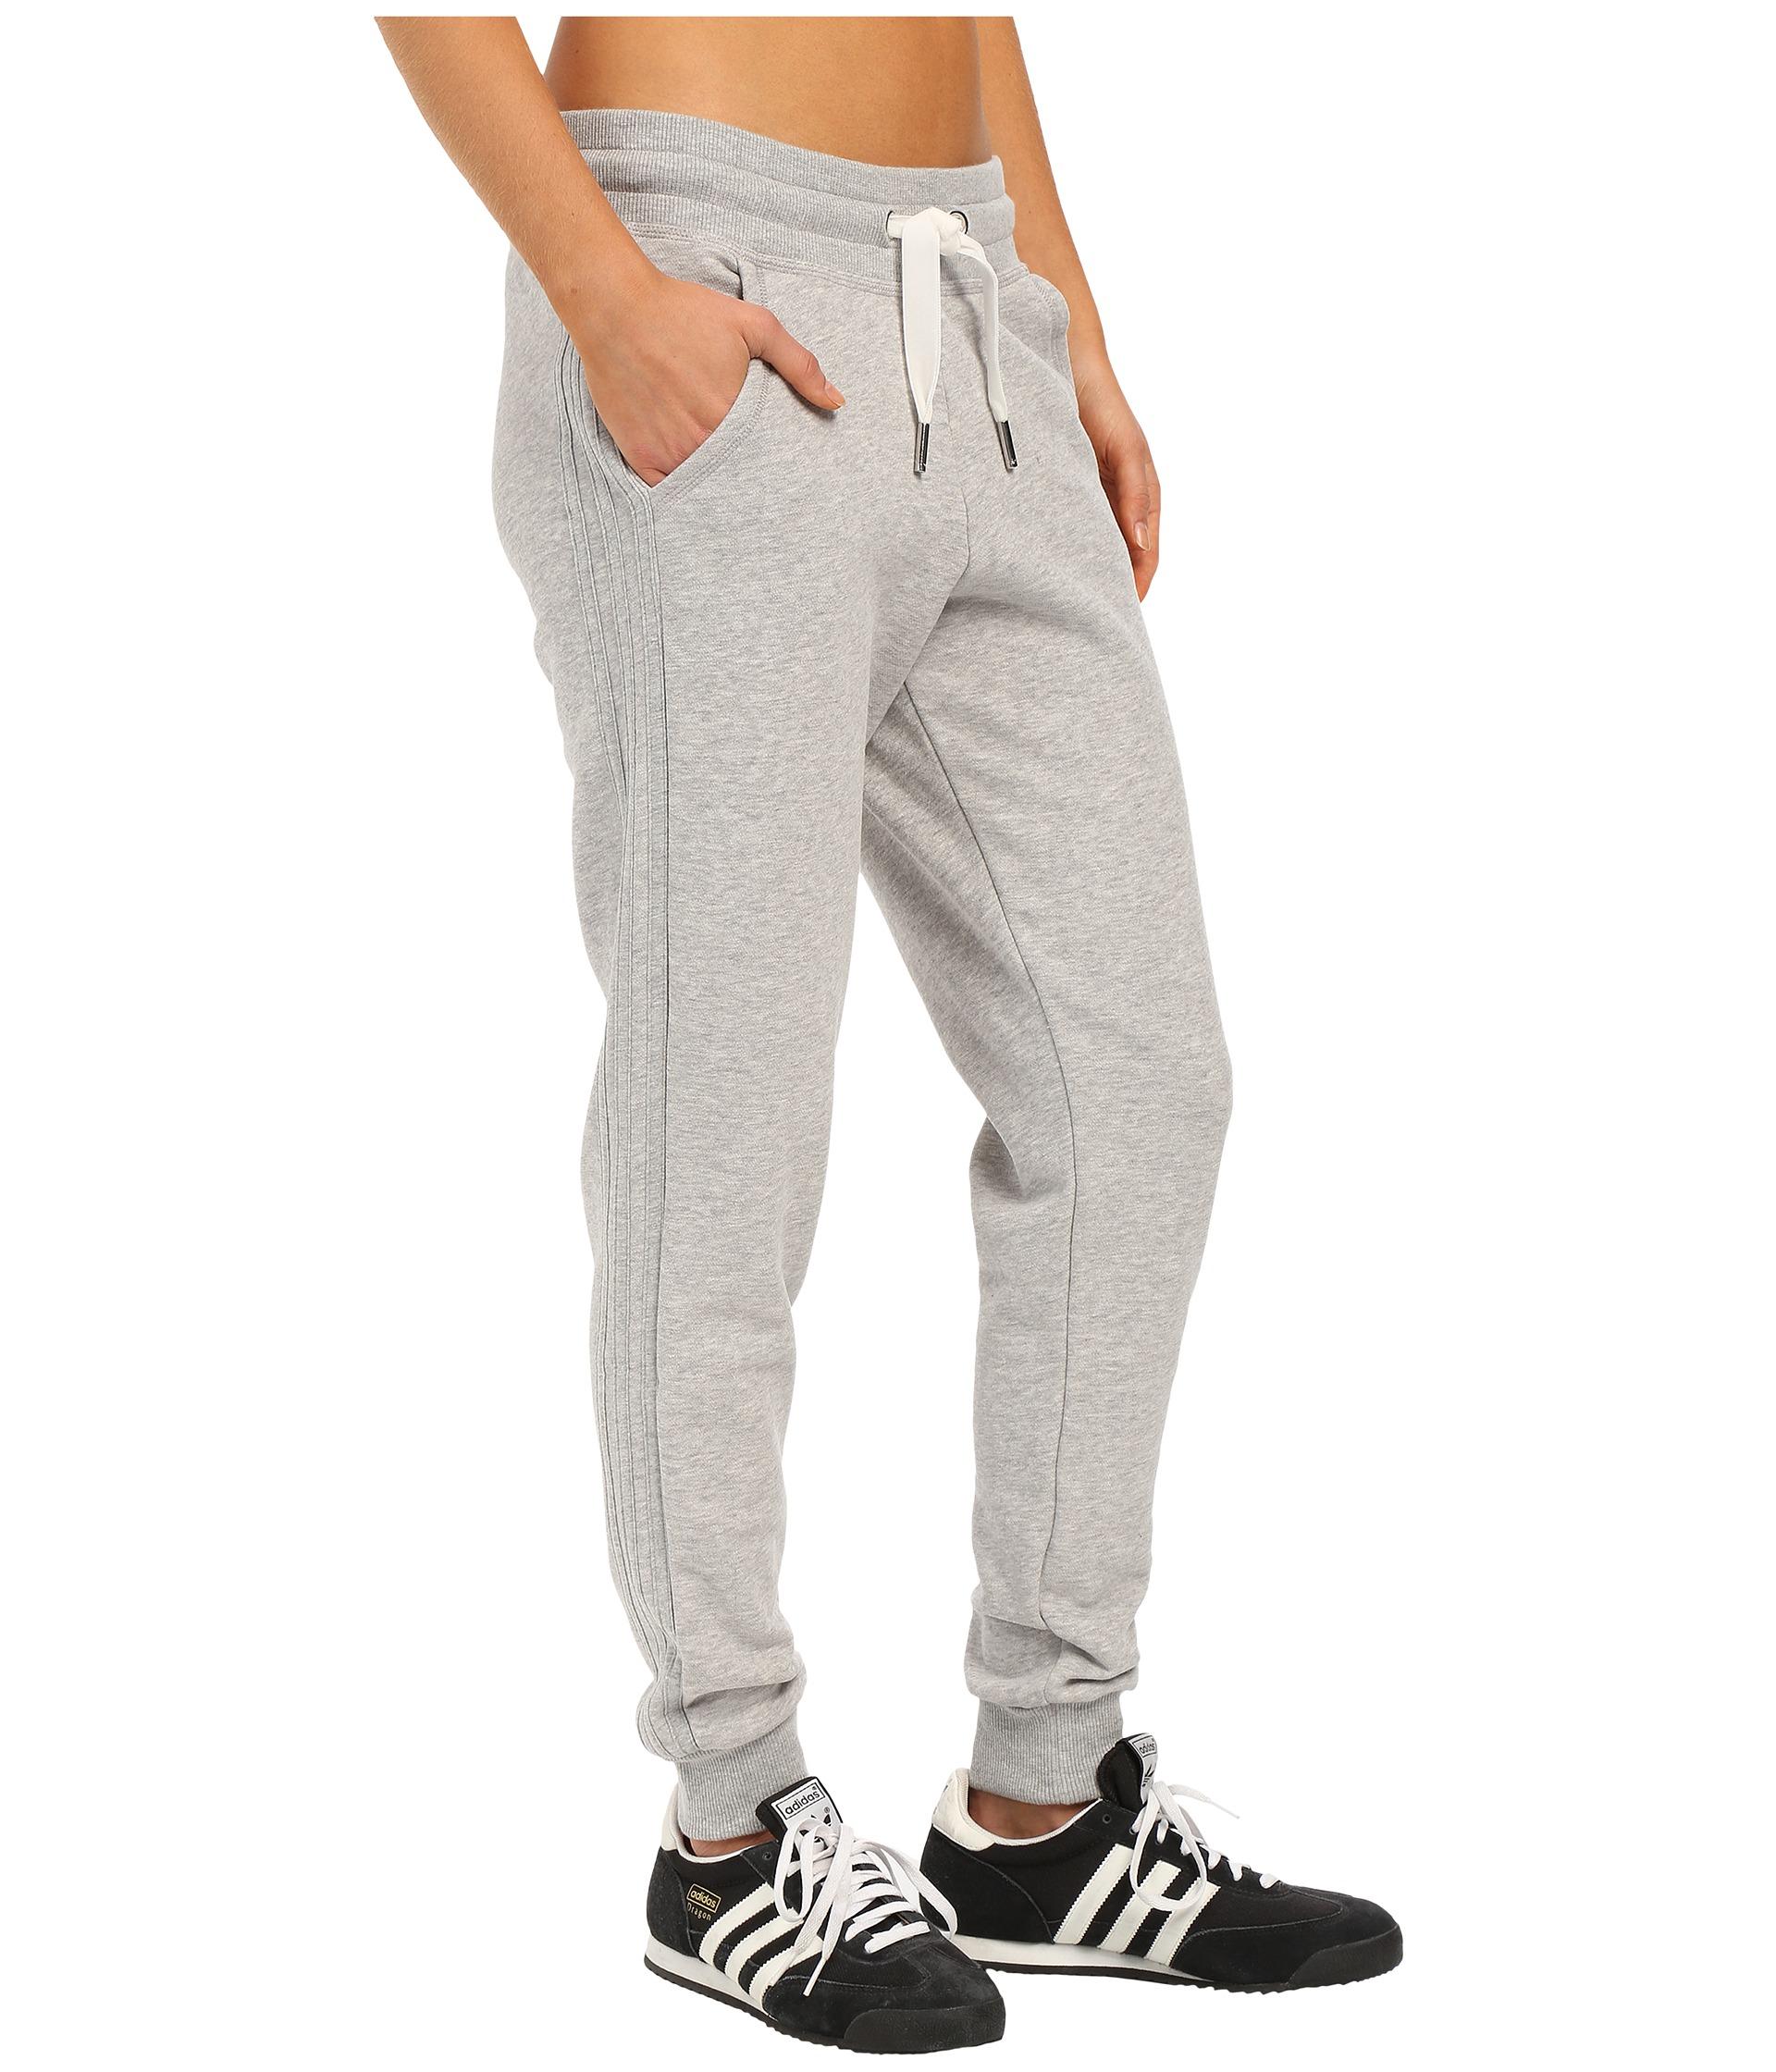 lyst adidas originals slim cuffed track pants in gray